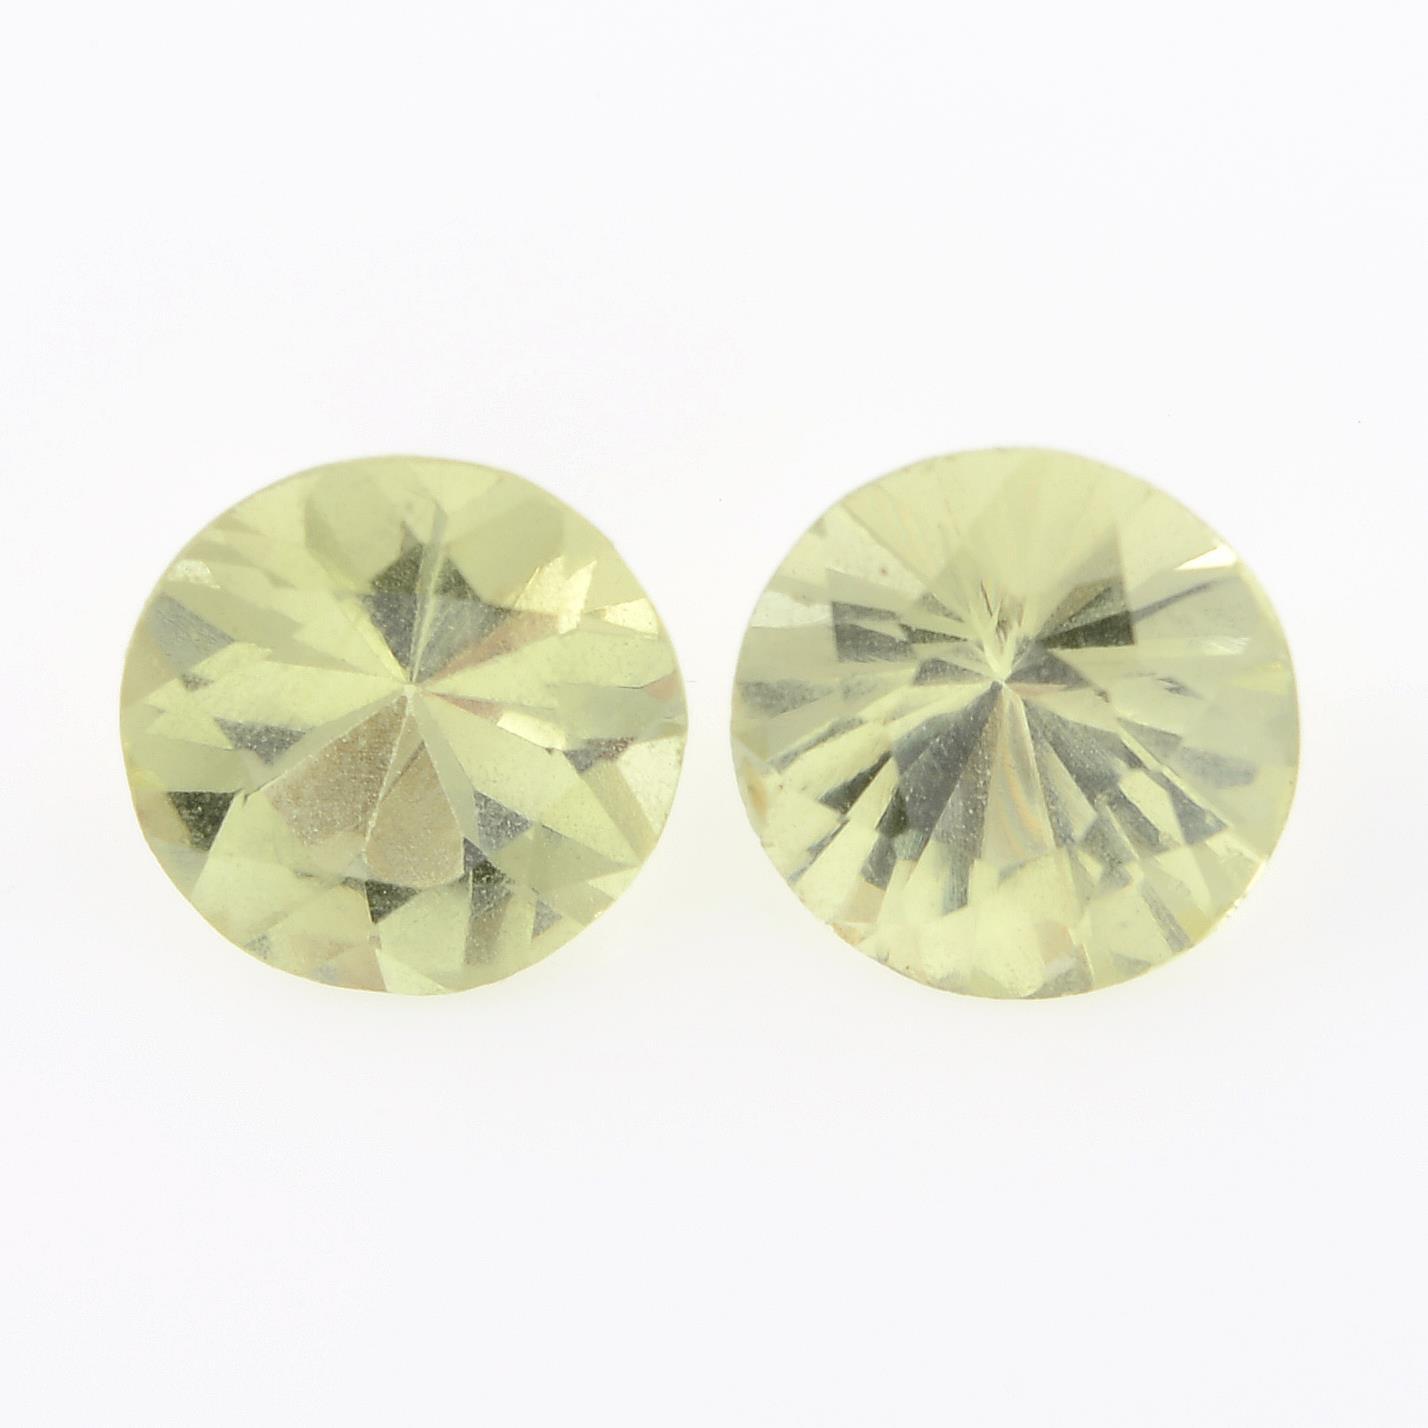 Two circular-shape chrysoberyl.